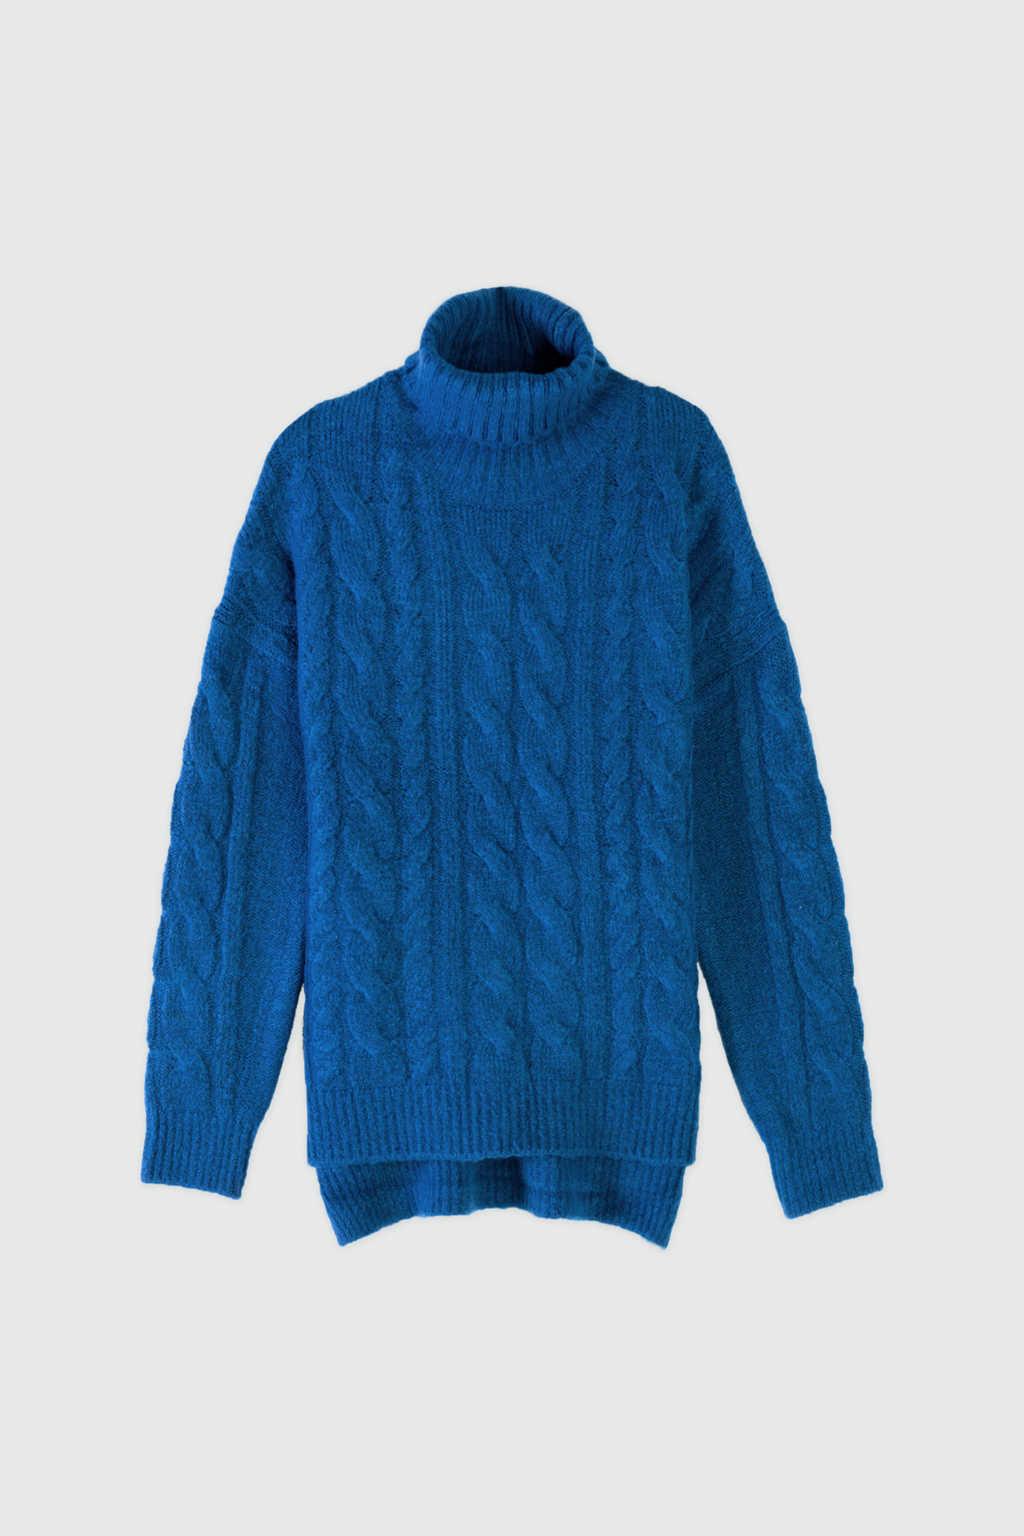 Sweater J019 Blue 7